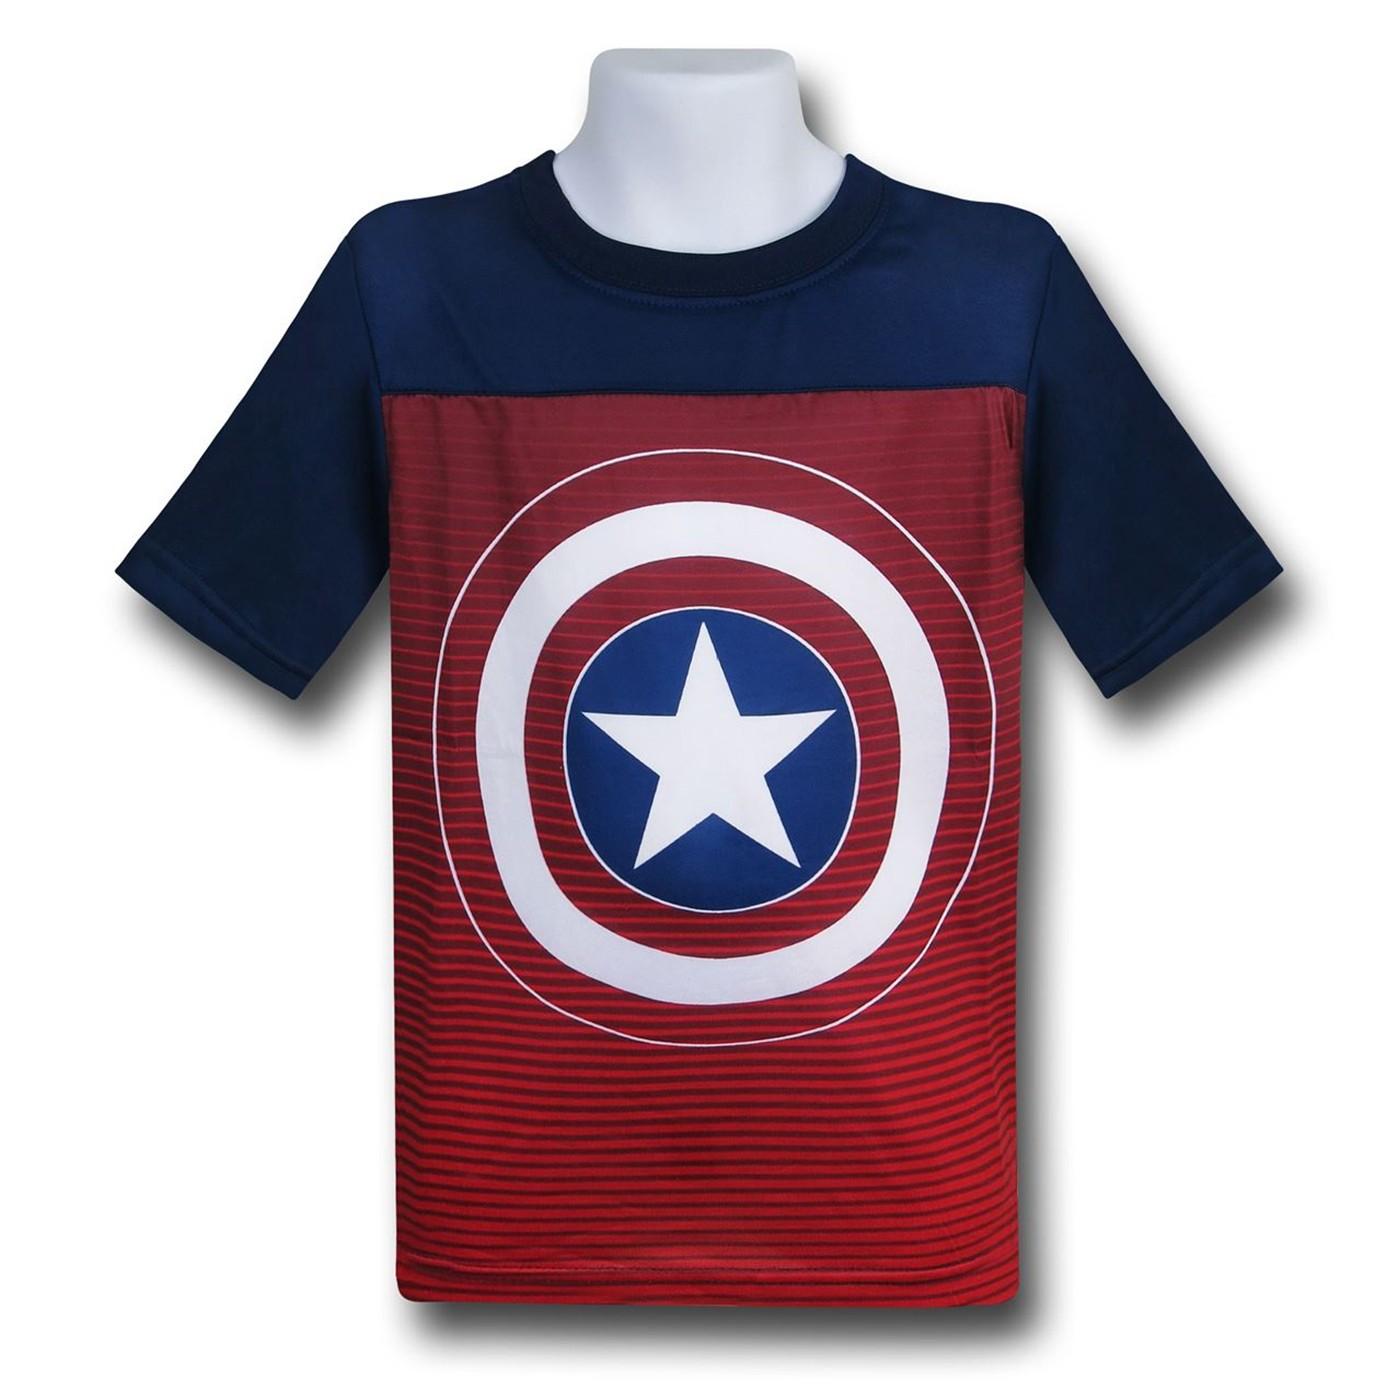 Captain America Kids Freedom Shield Cut & Sew T-Shirt